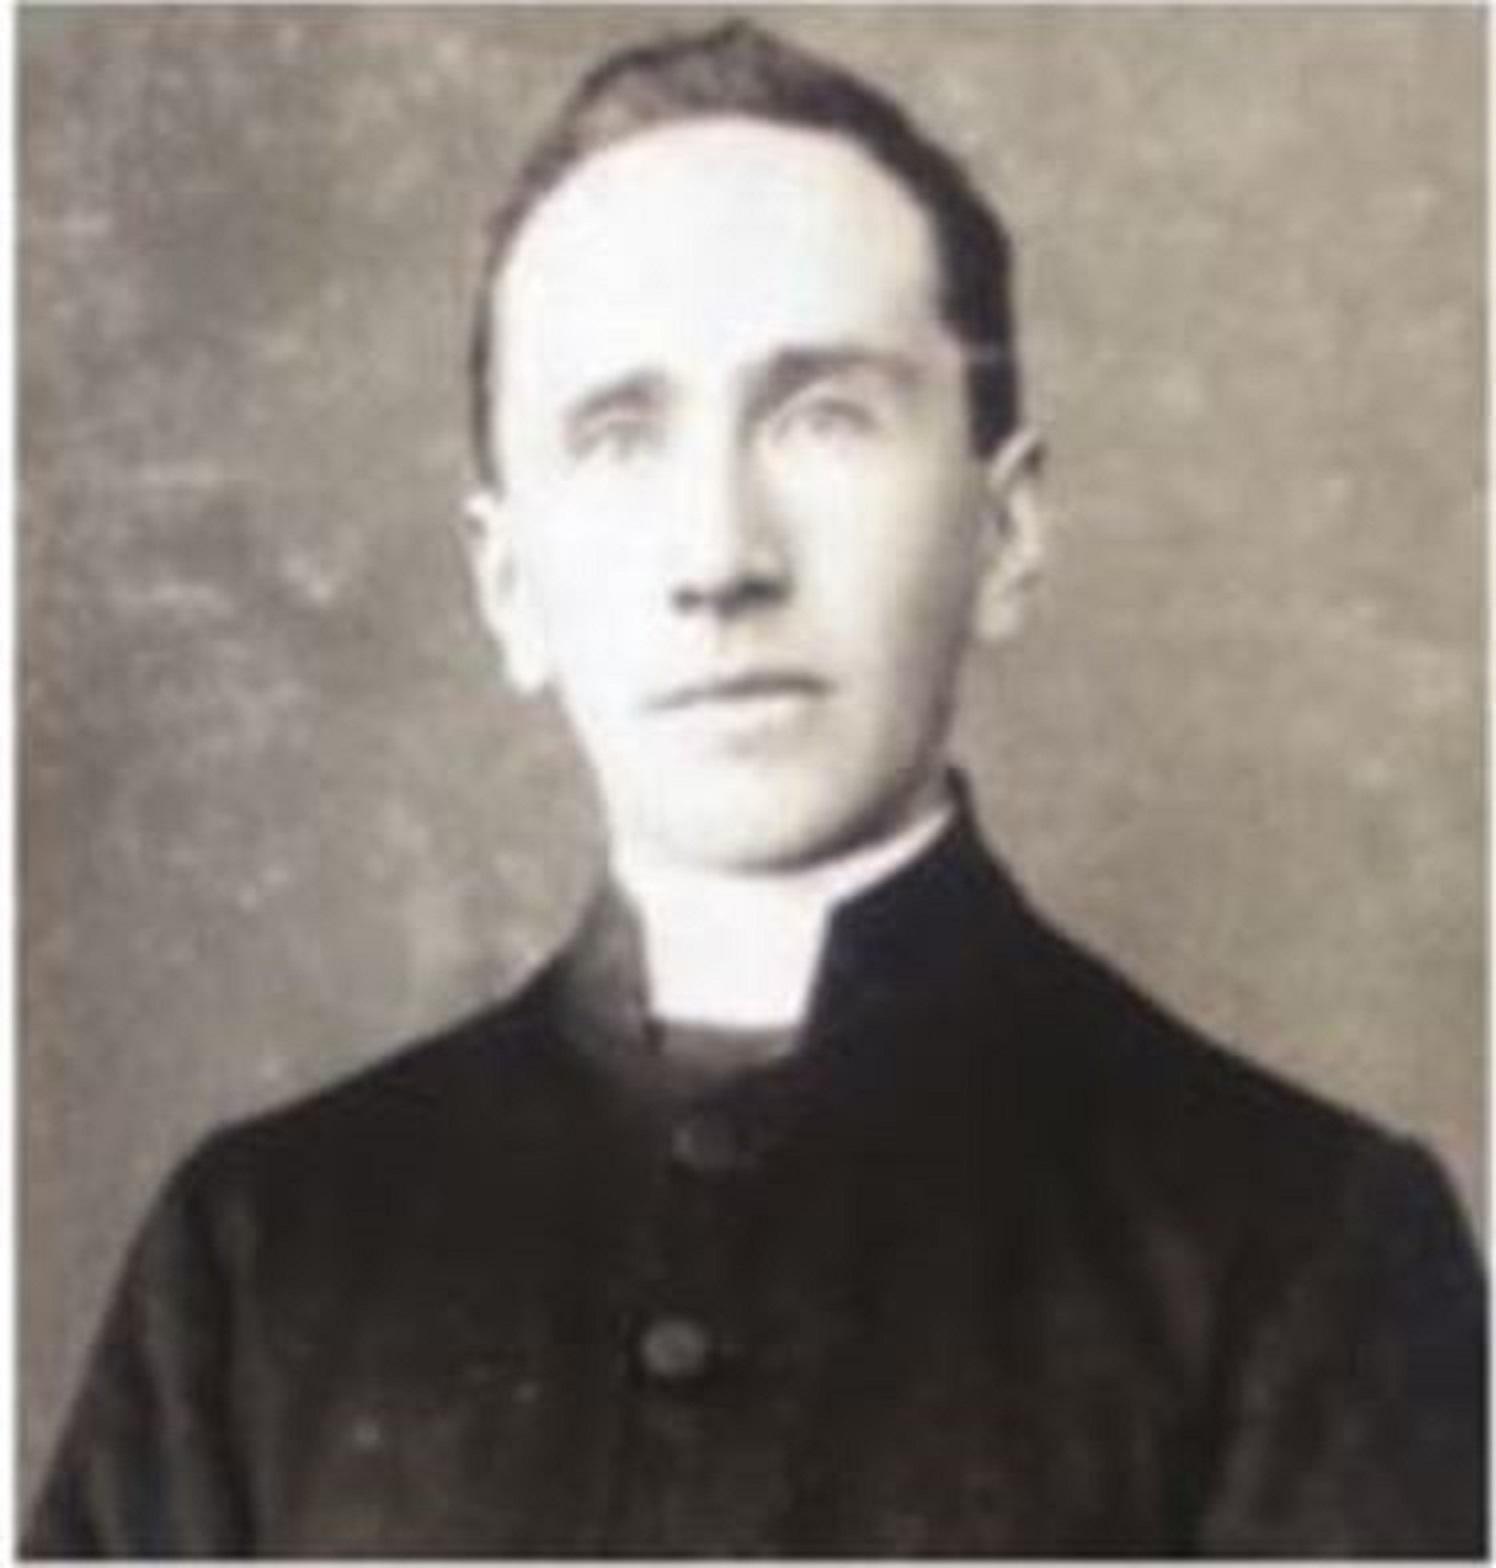 Fr Patrick Keaveny 1860-1915